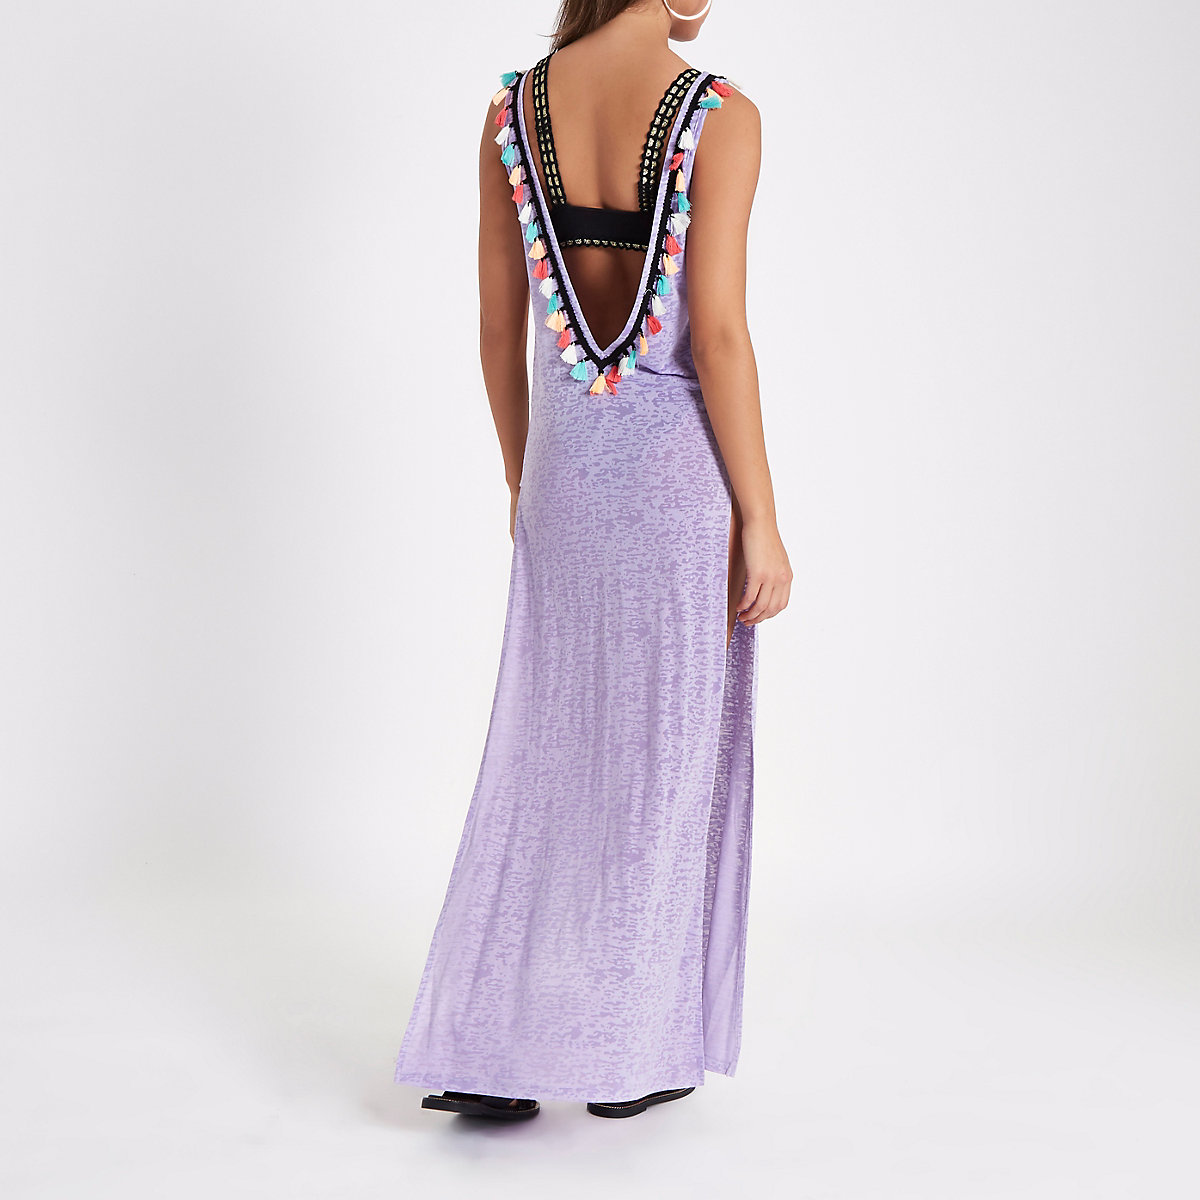 8c891c3d27 Light purple tassel cut out maxi beach dress - Kaftans   Beach Cover-Ups -  Swimwear   Beachwear - women